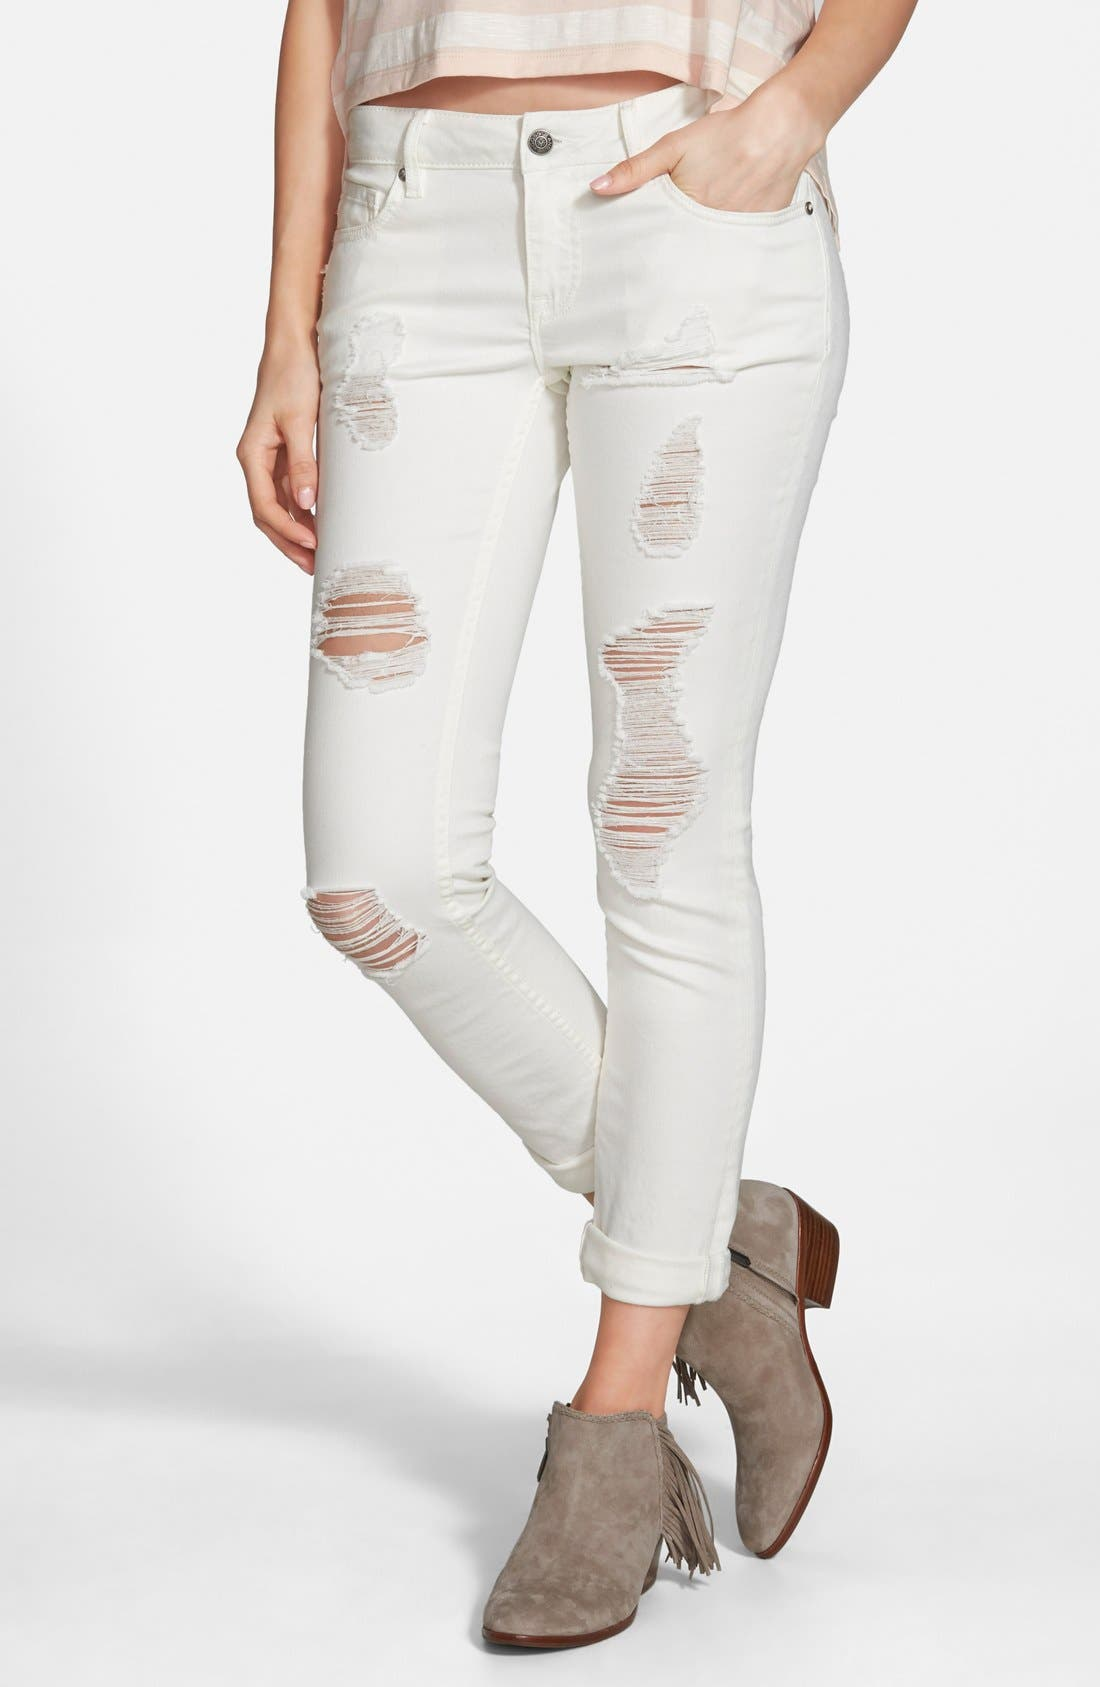 Alternate Image 1 Selected - Vigoss 'Tomboy' Destroyed Skinny Jeans (Off White)